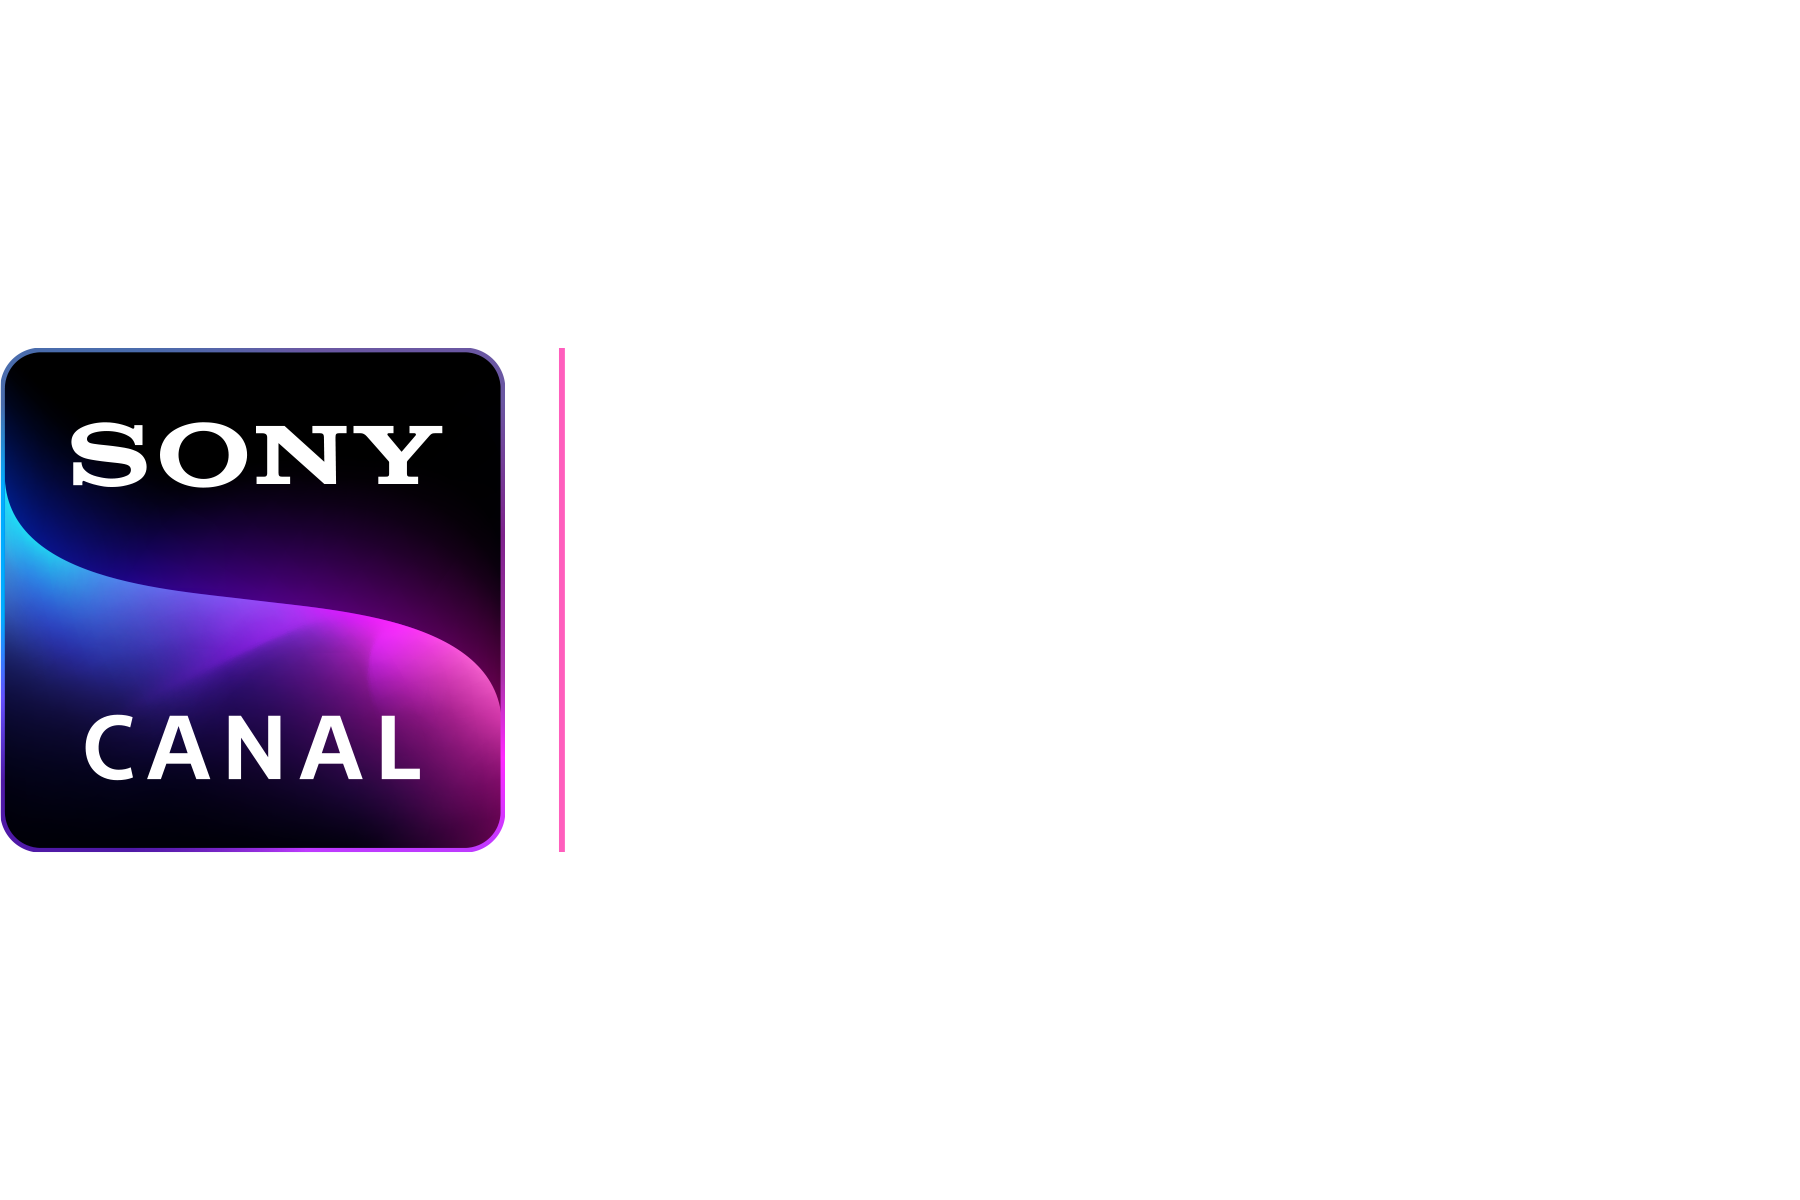 Sony Canal Novelas